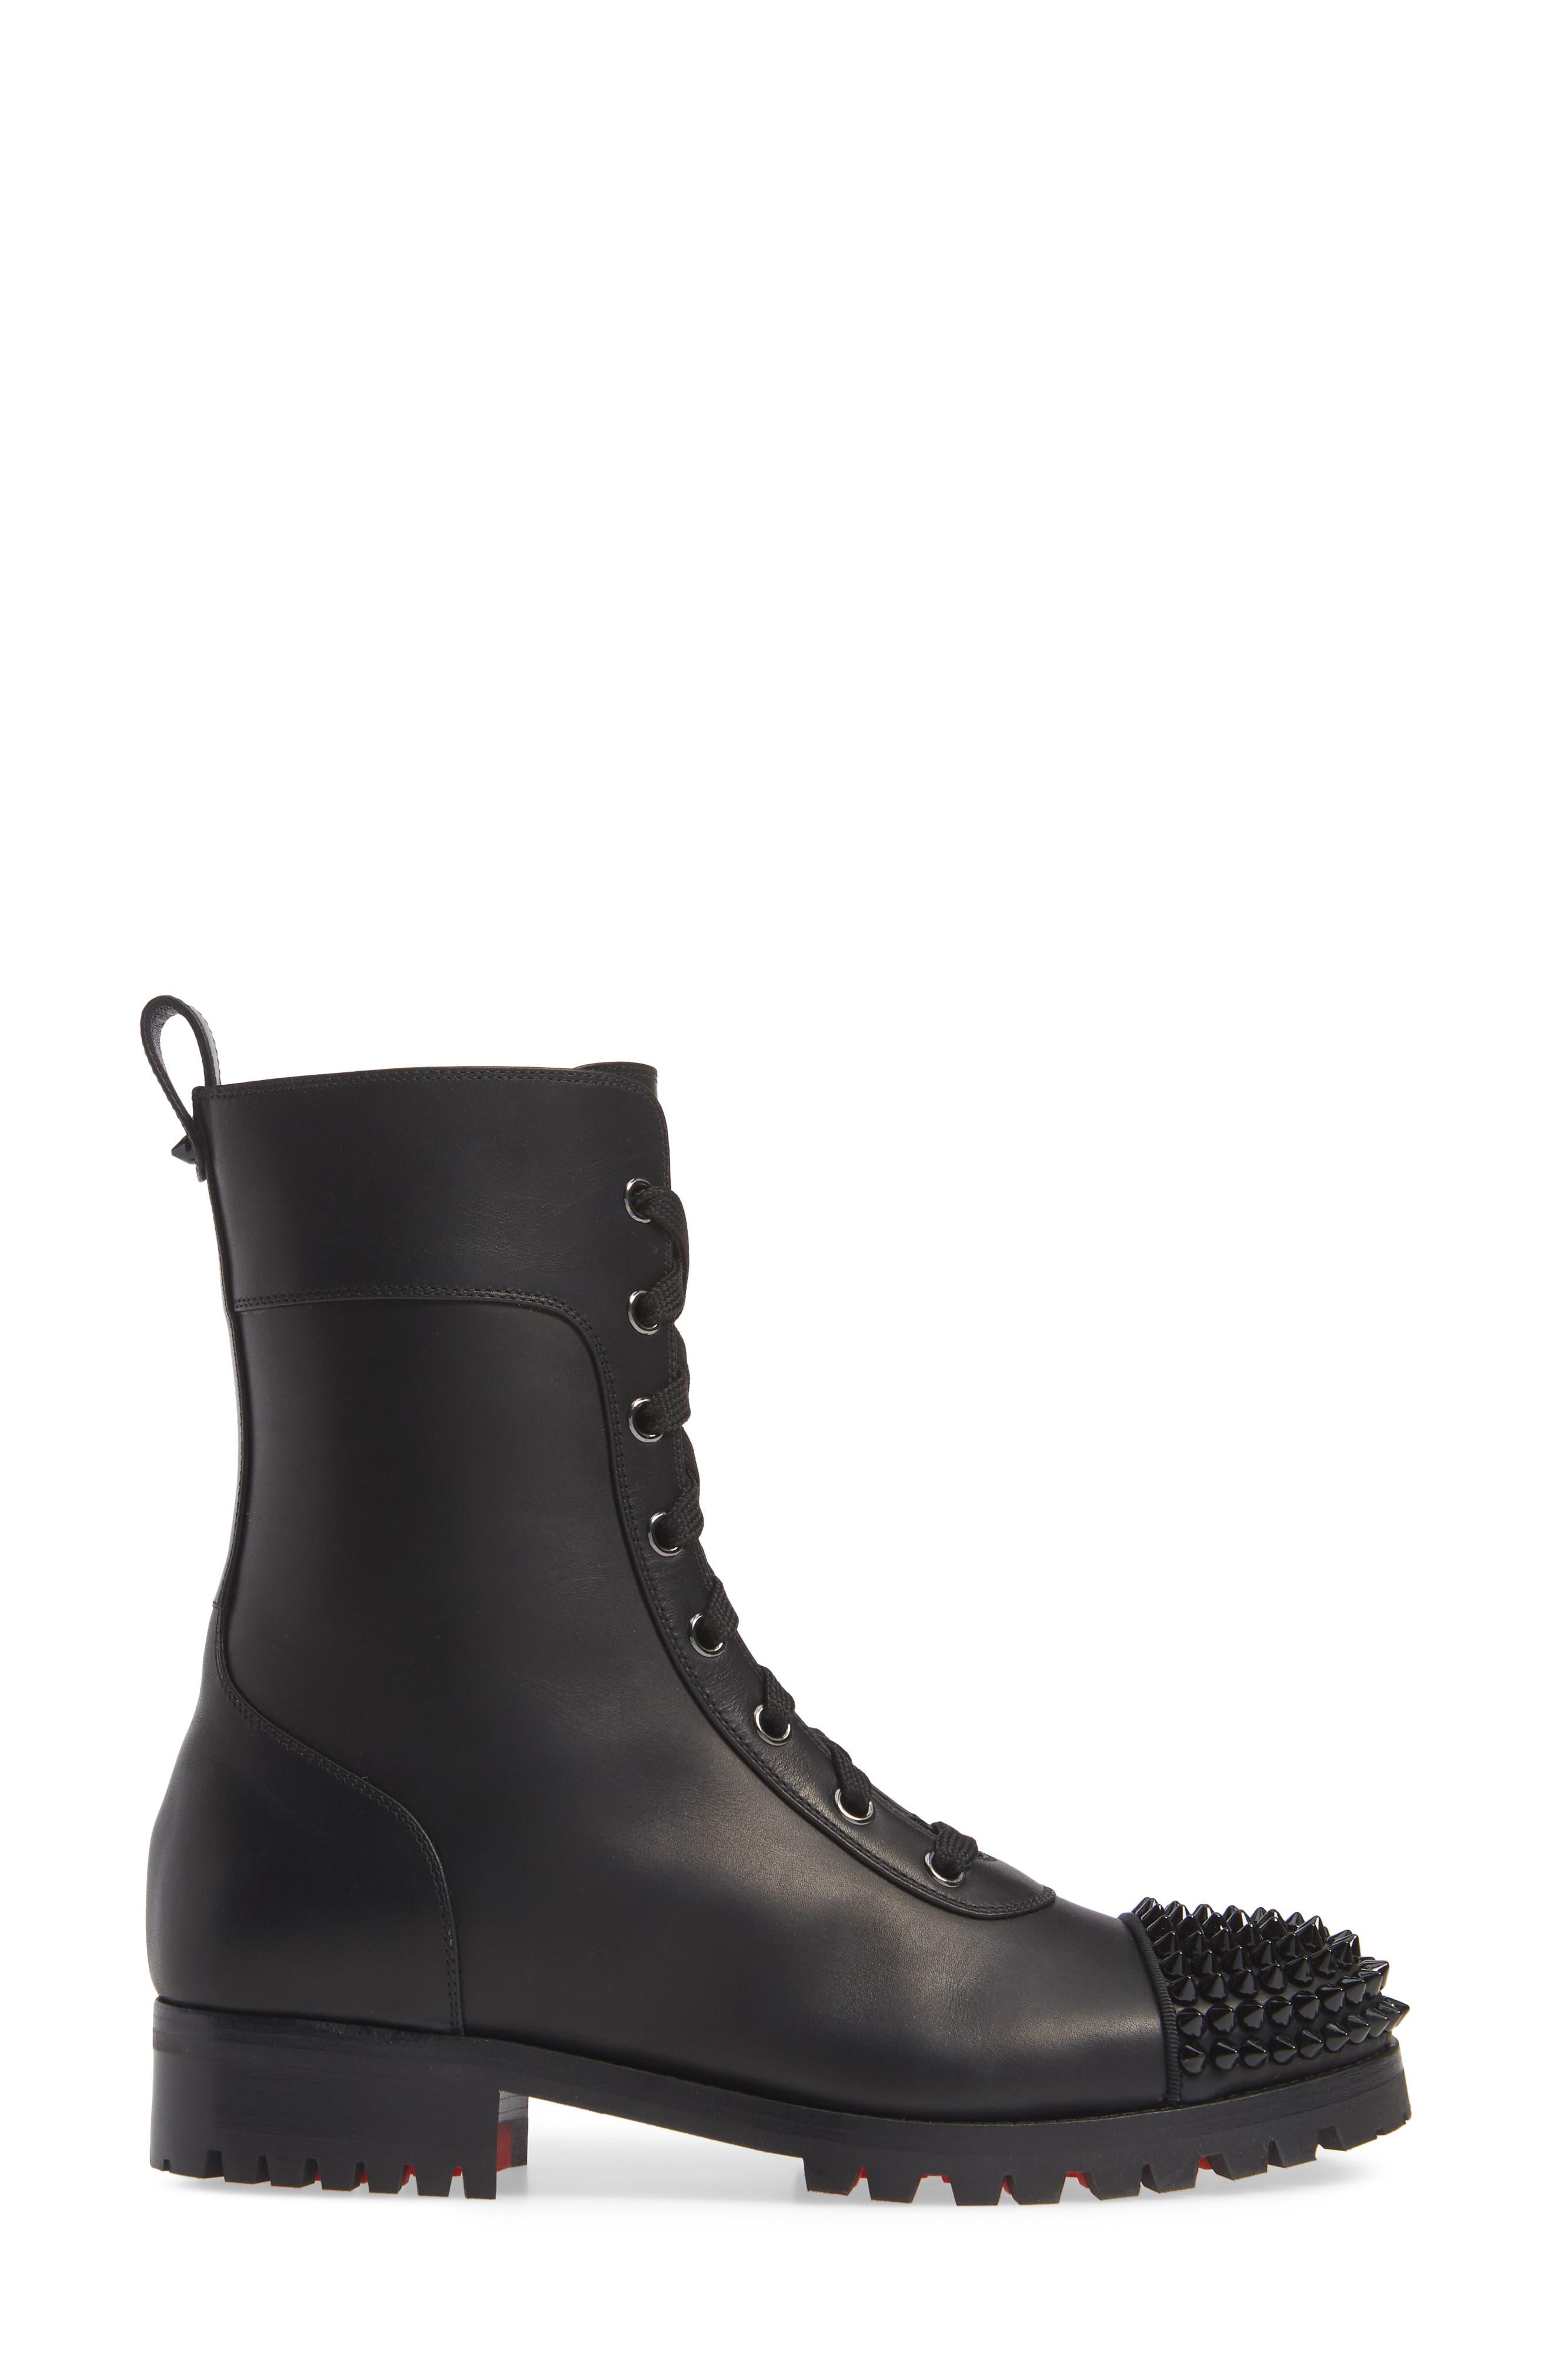 CHRISTIAN LOUBOUTIN, Lace-Up Hiker Boot, Alternate thumbnail 3, color, BLACK